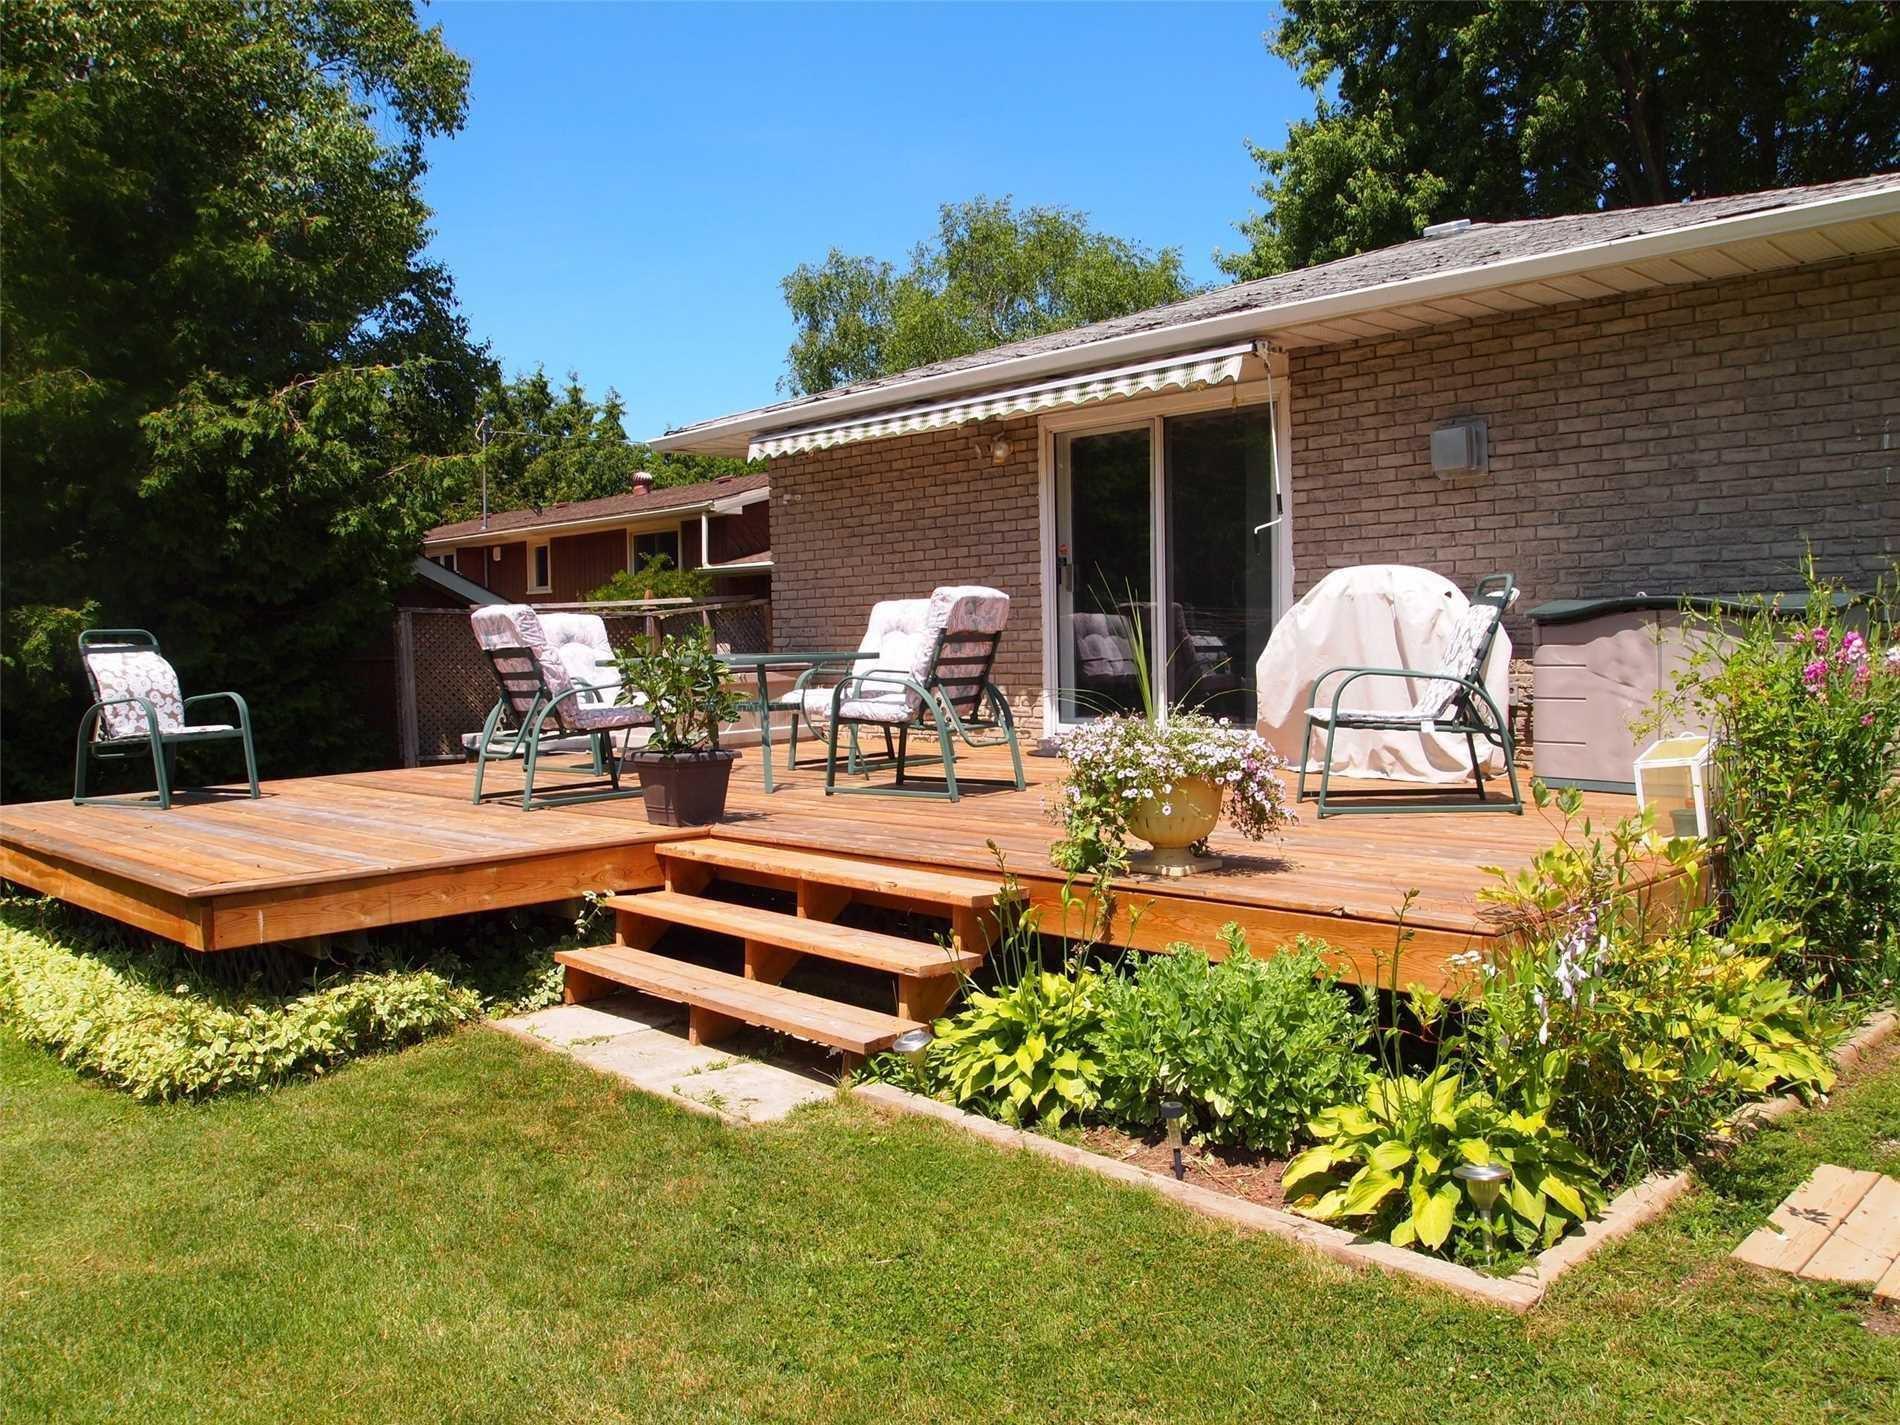 Photo 19: Photos: 105 Fifth Street in Brock: Beaverton House (Bungalow) for sale : MLS®# N4564596